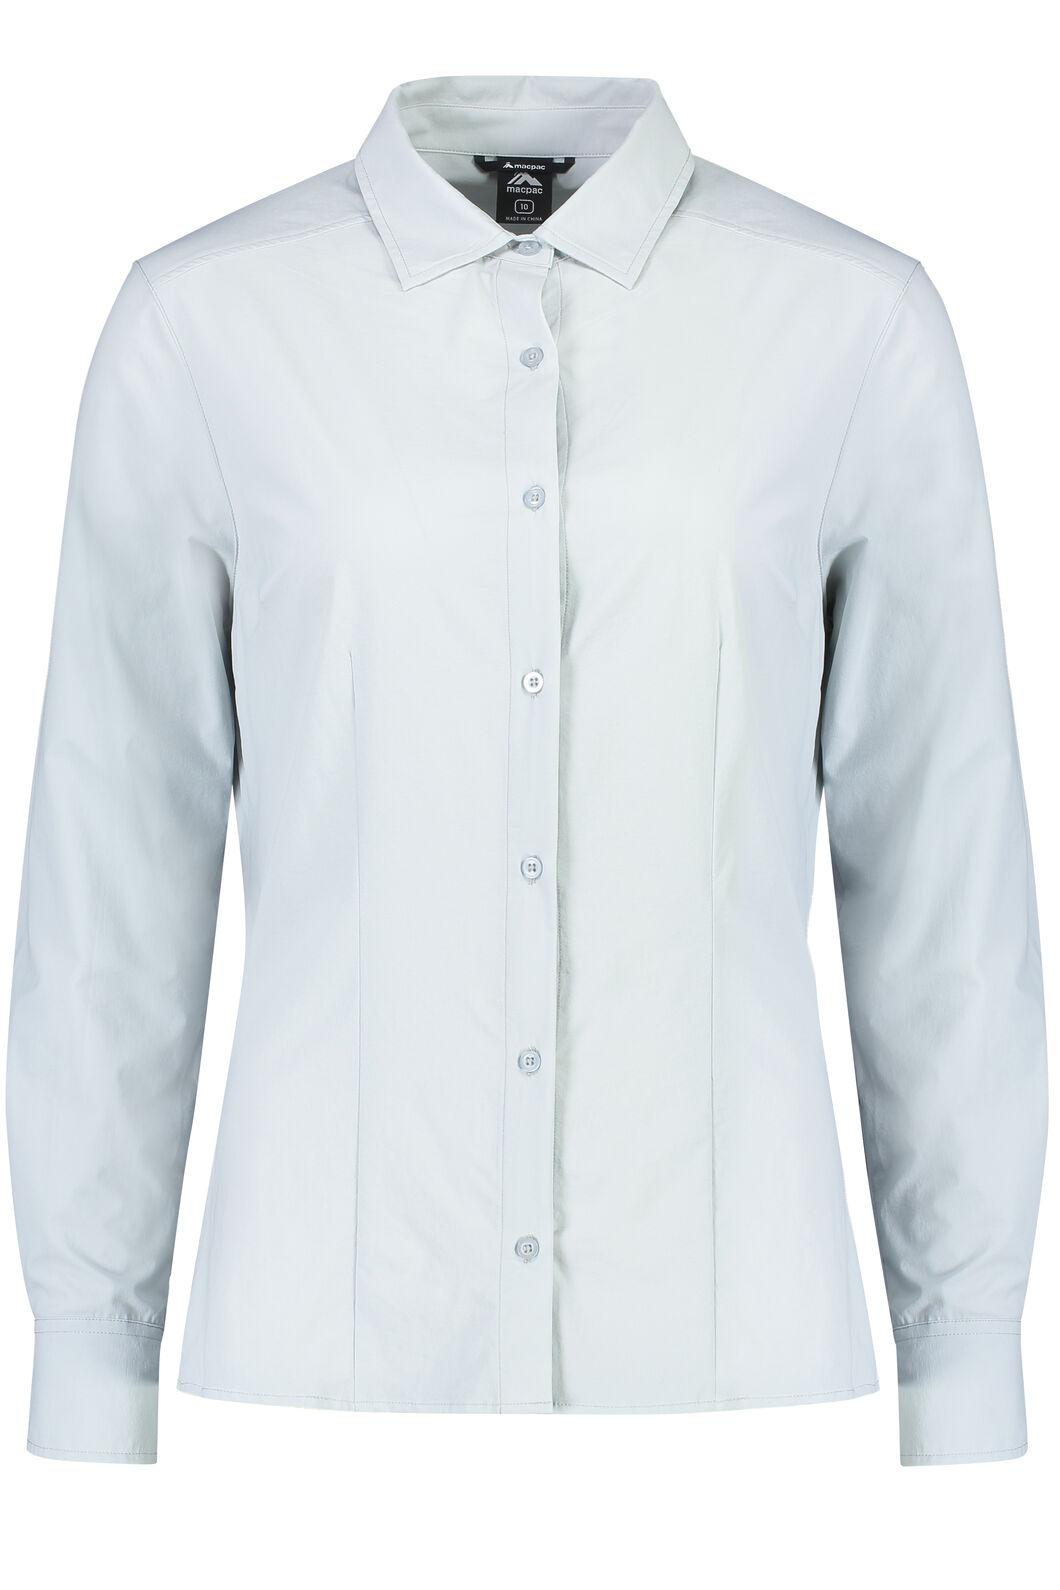 Macpac Eclipse Long Sleeve Shirt - Women's, Pearl, hi-res